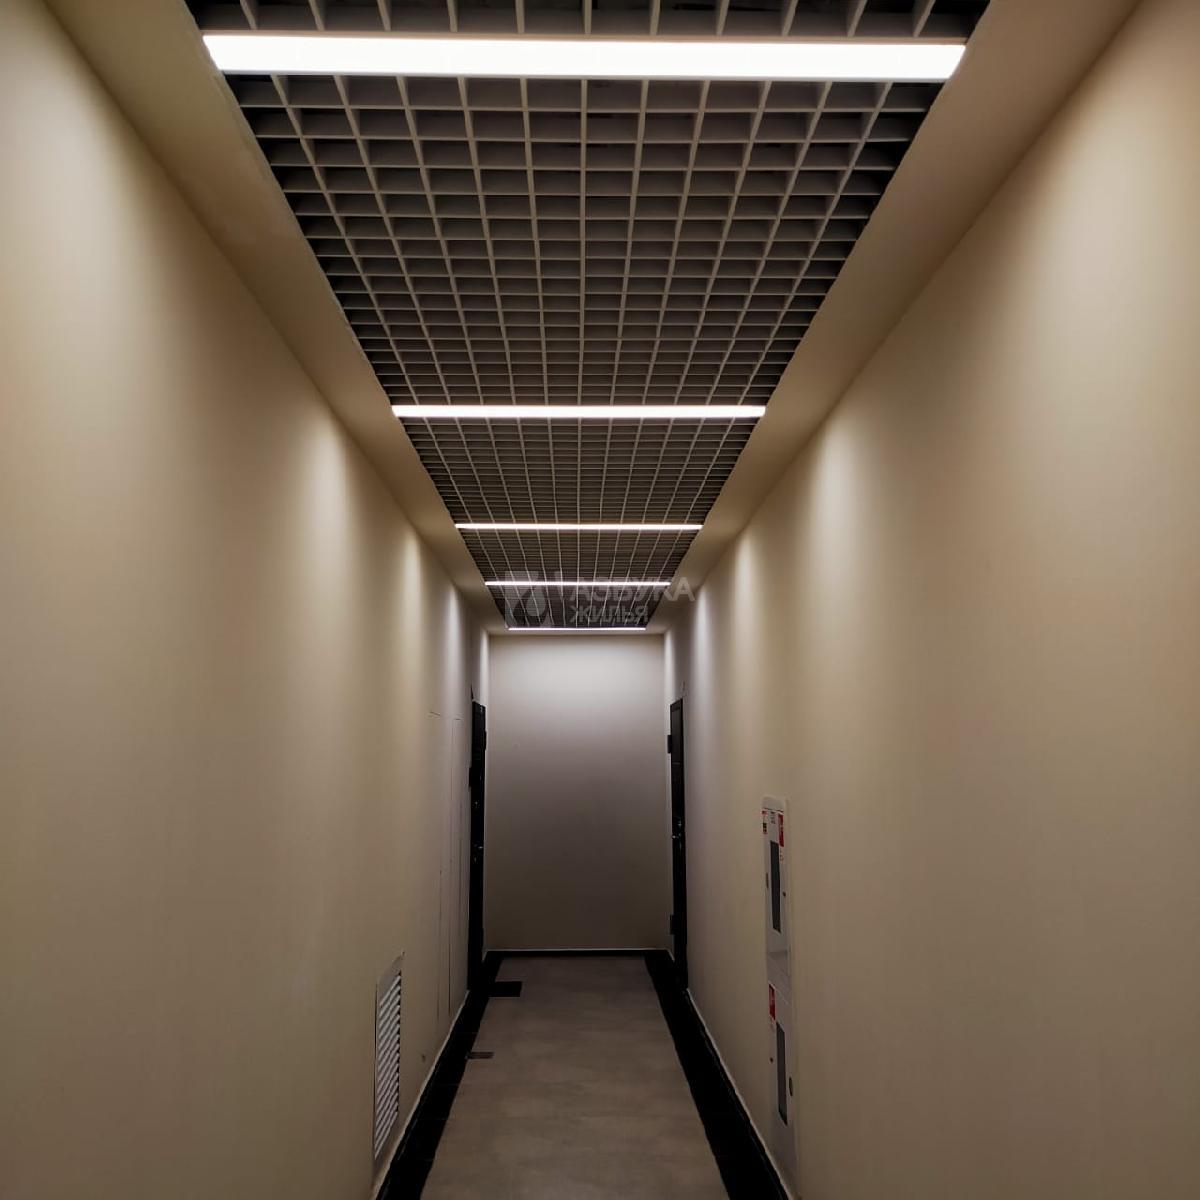 Фото №5 - 3-комнатная квартира, Москва, Серебрякова проезд 11 корпус 1, метро Ботанический сад